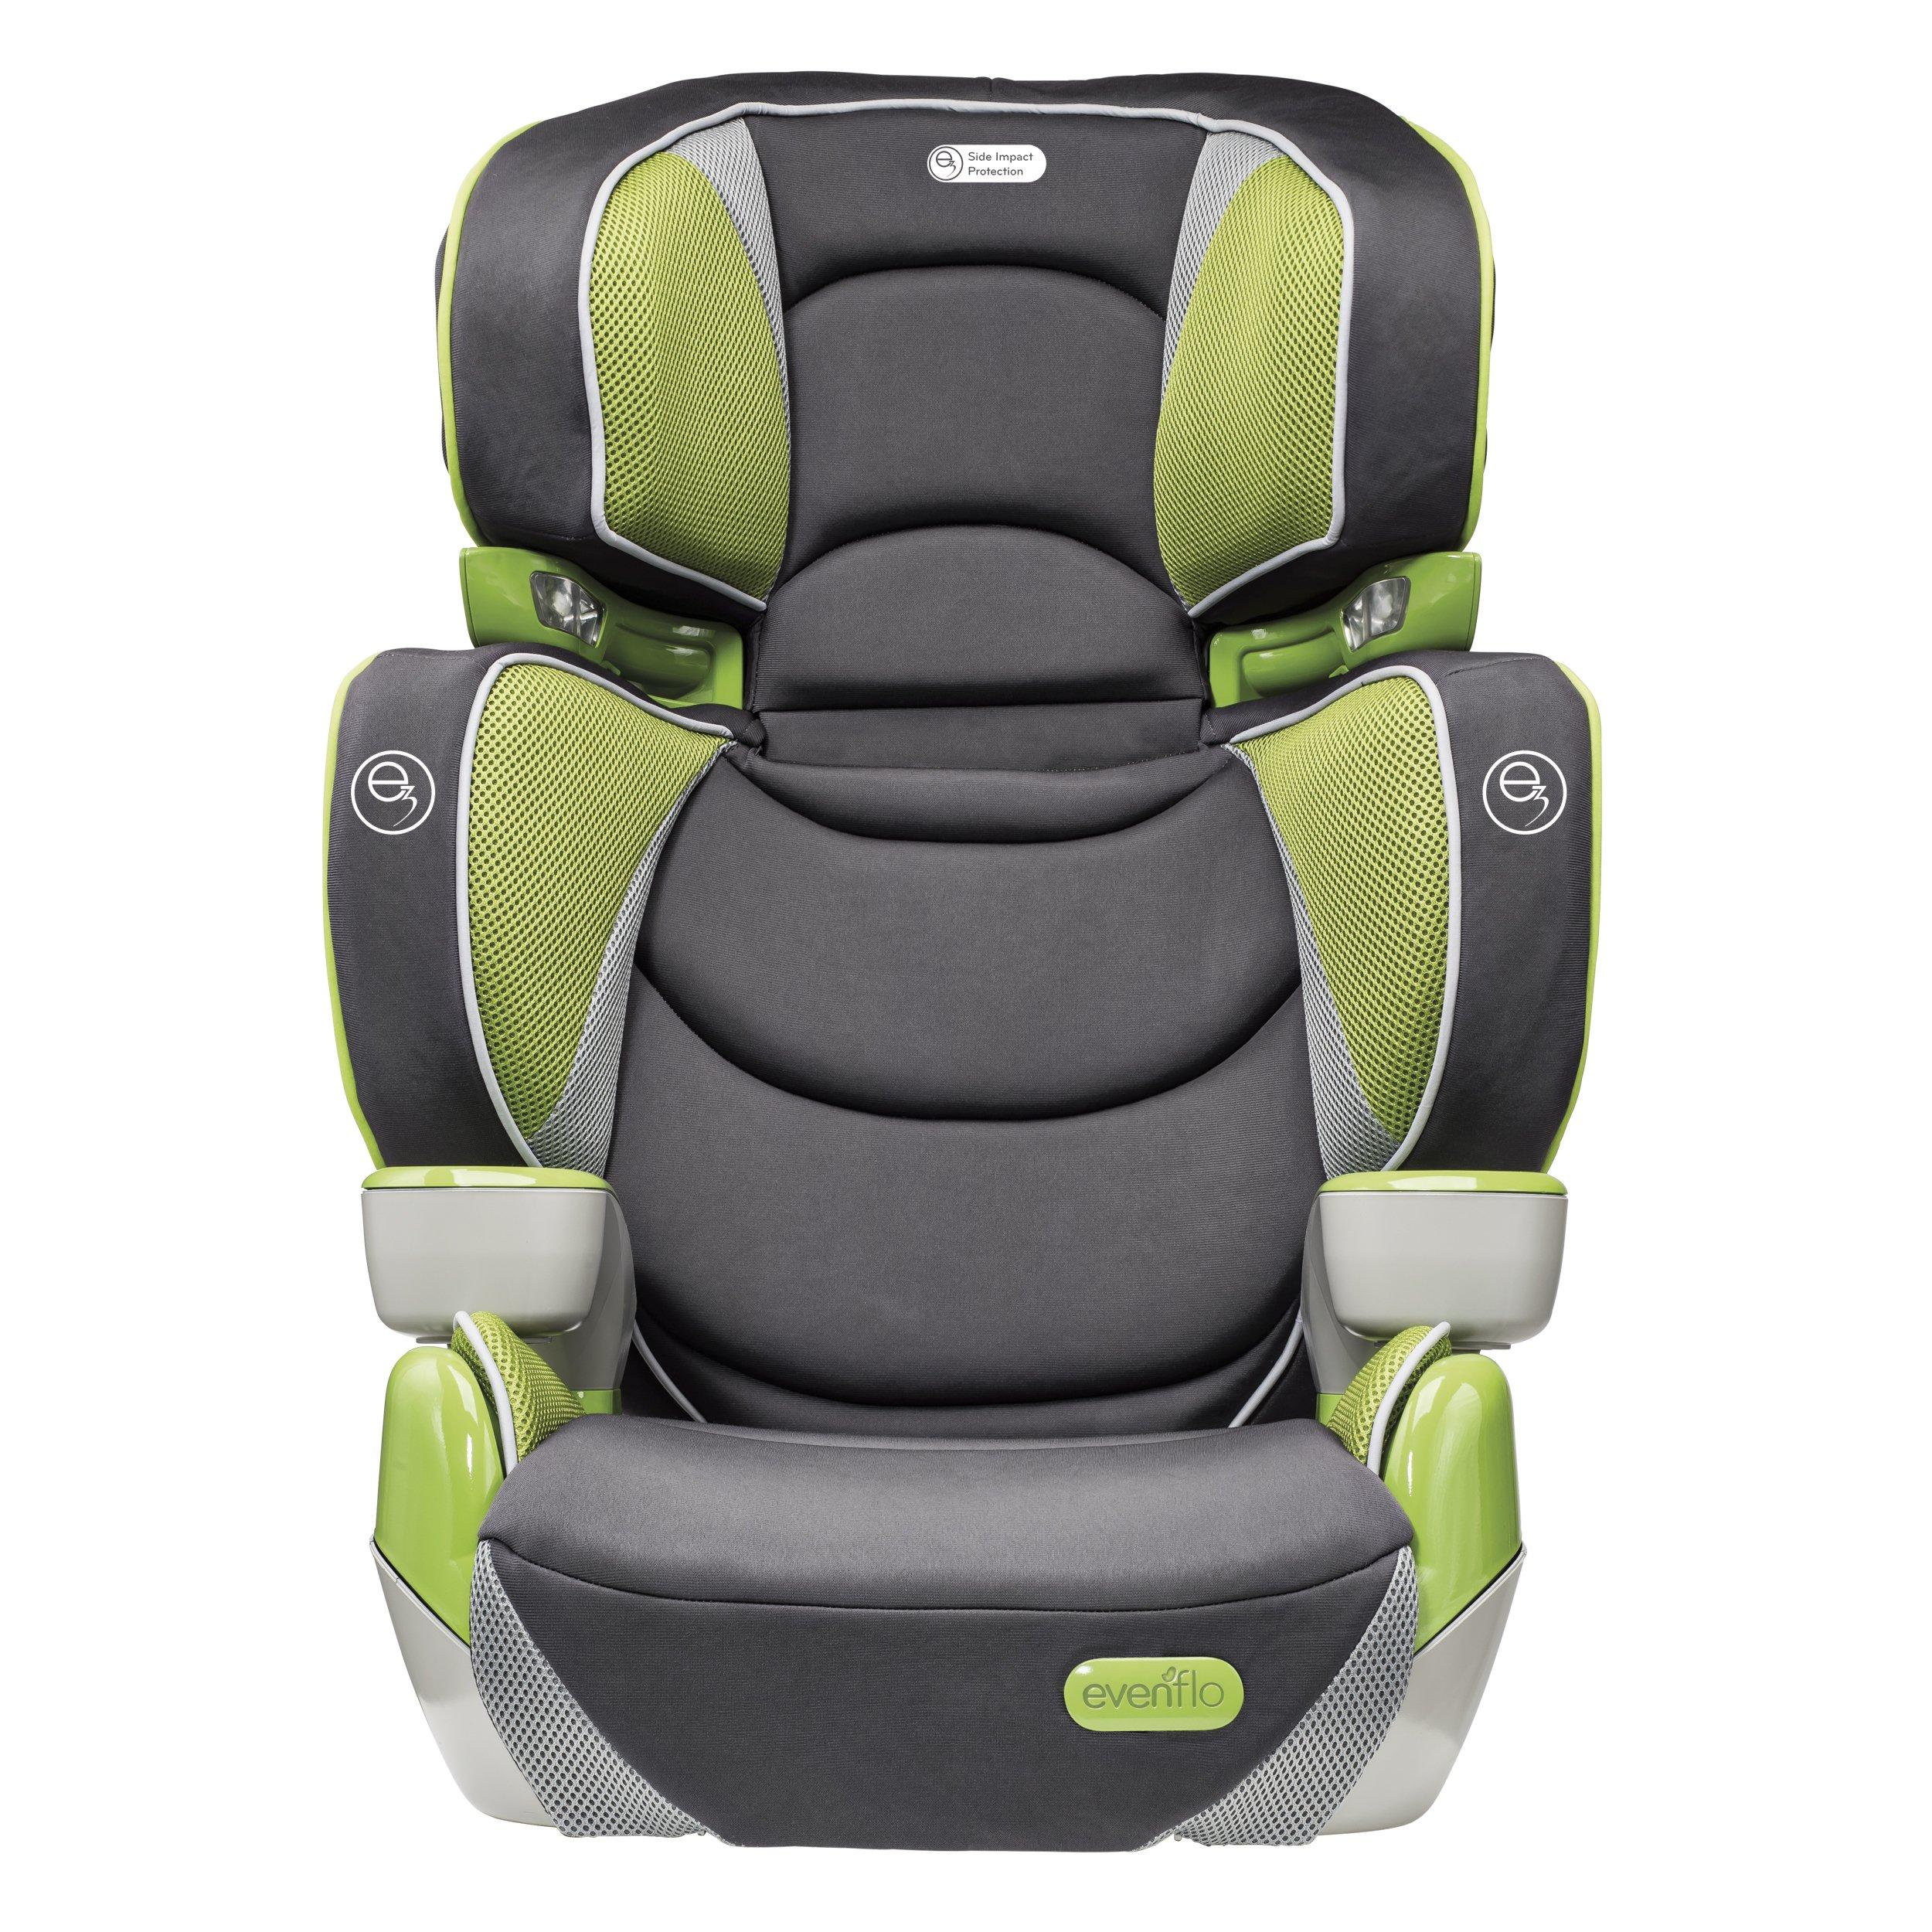 Amazon.com : Evenflo RightFit Booster Car Seat, Capri : Baby